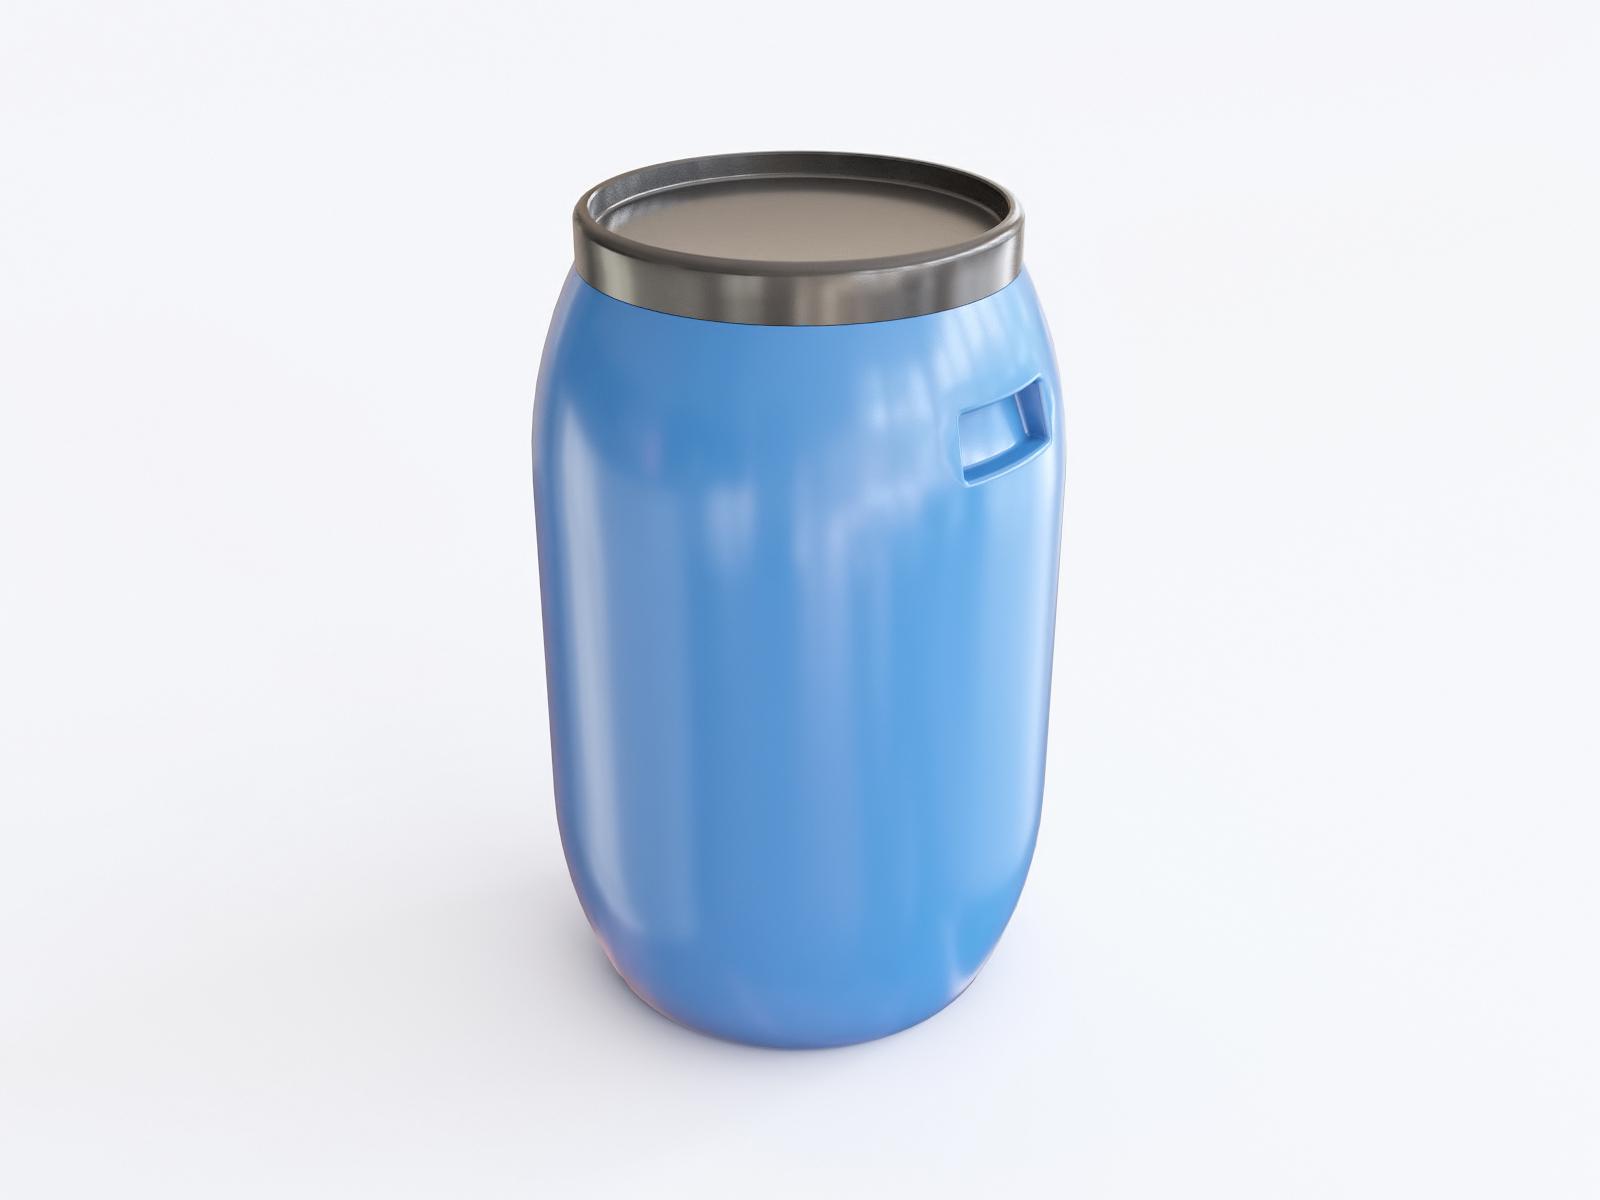 بشکه پلاستیکی 120 لیتری